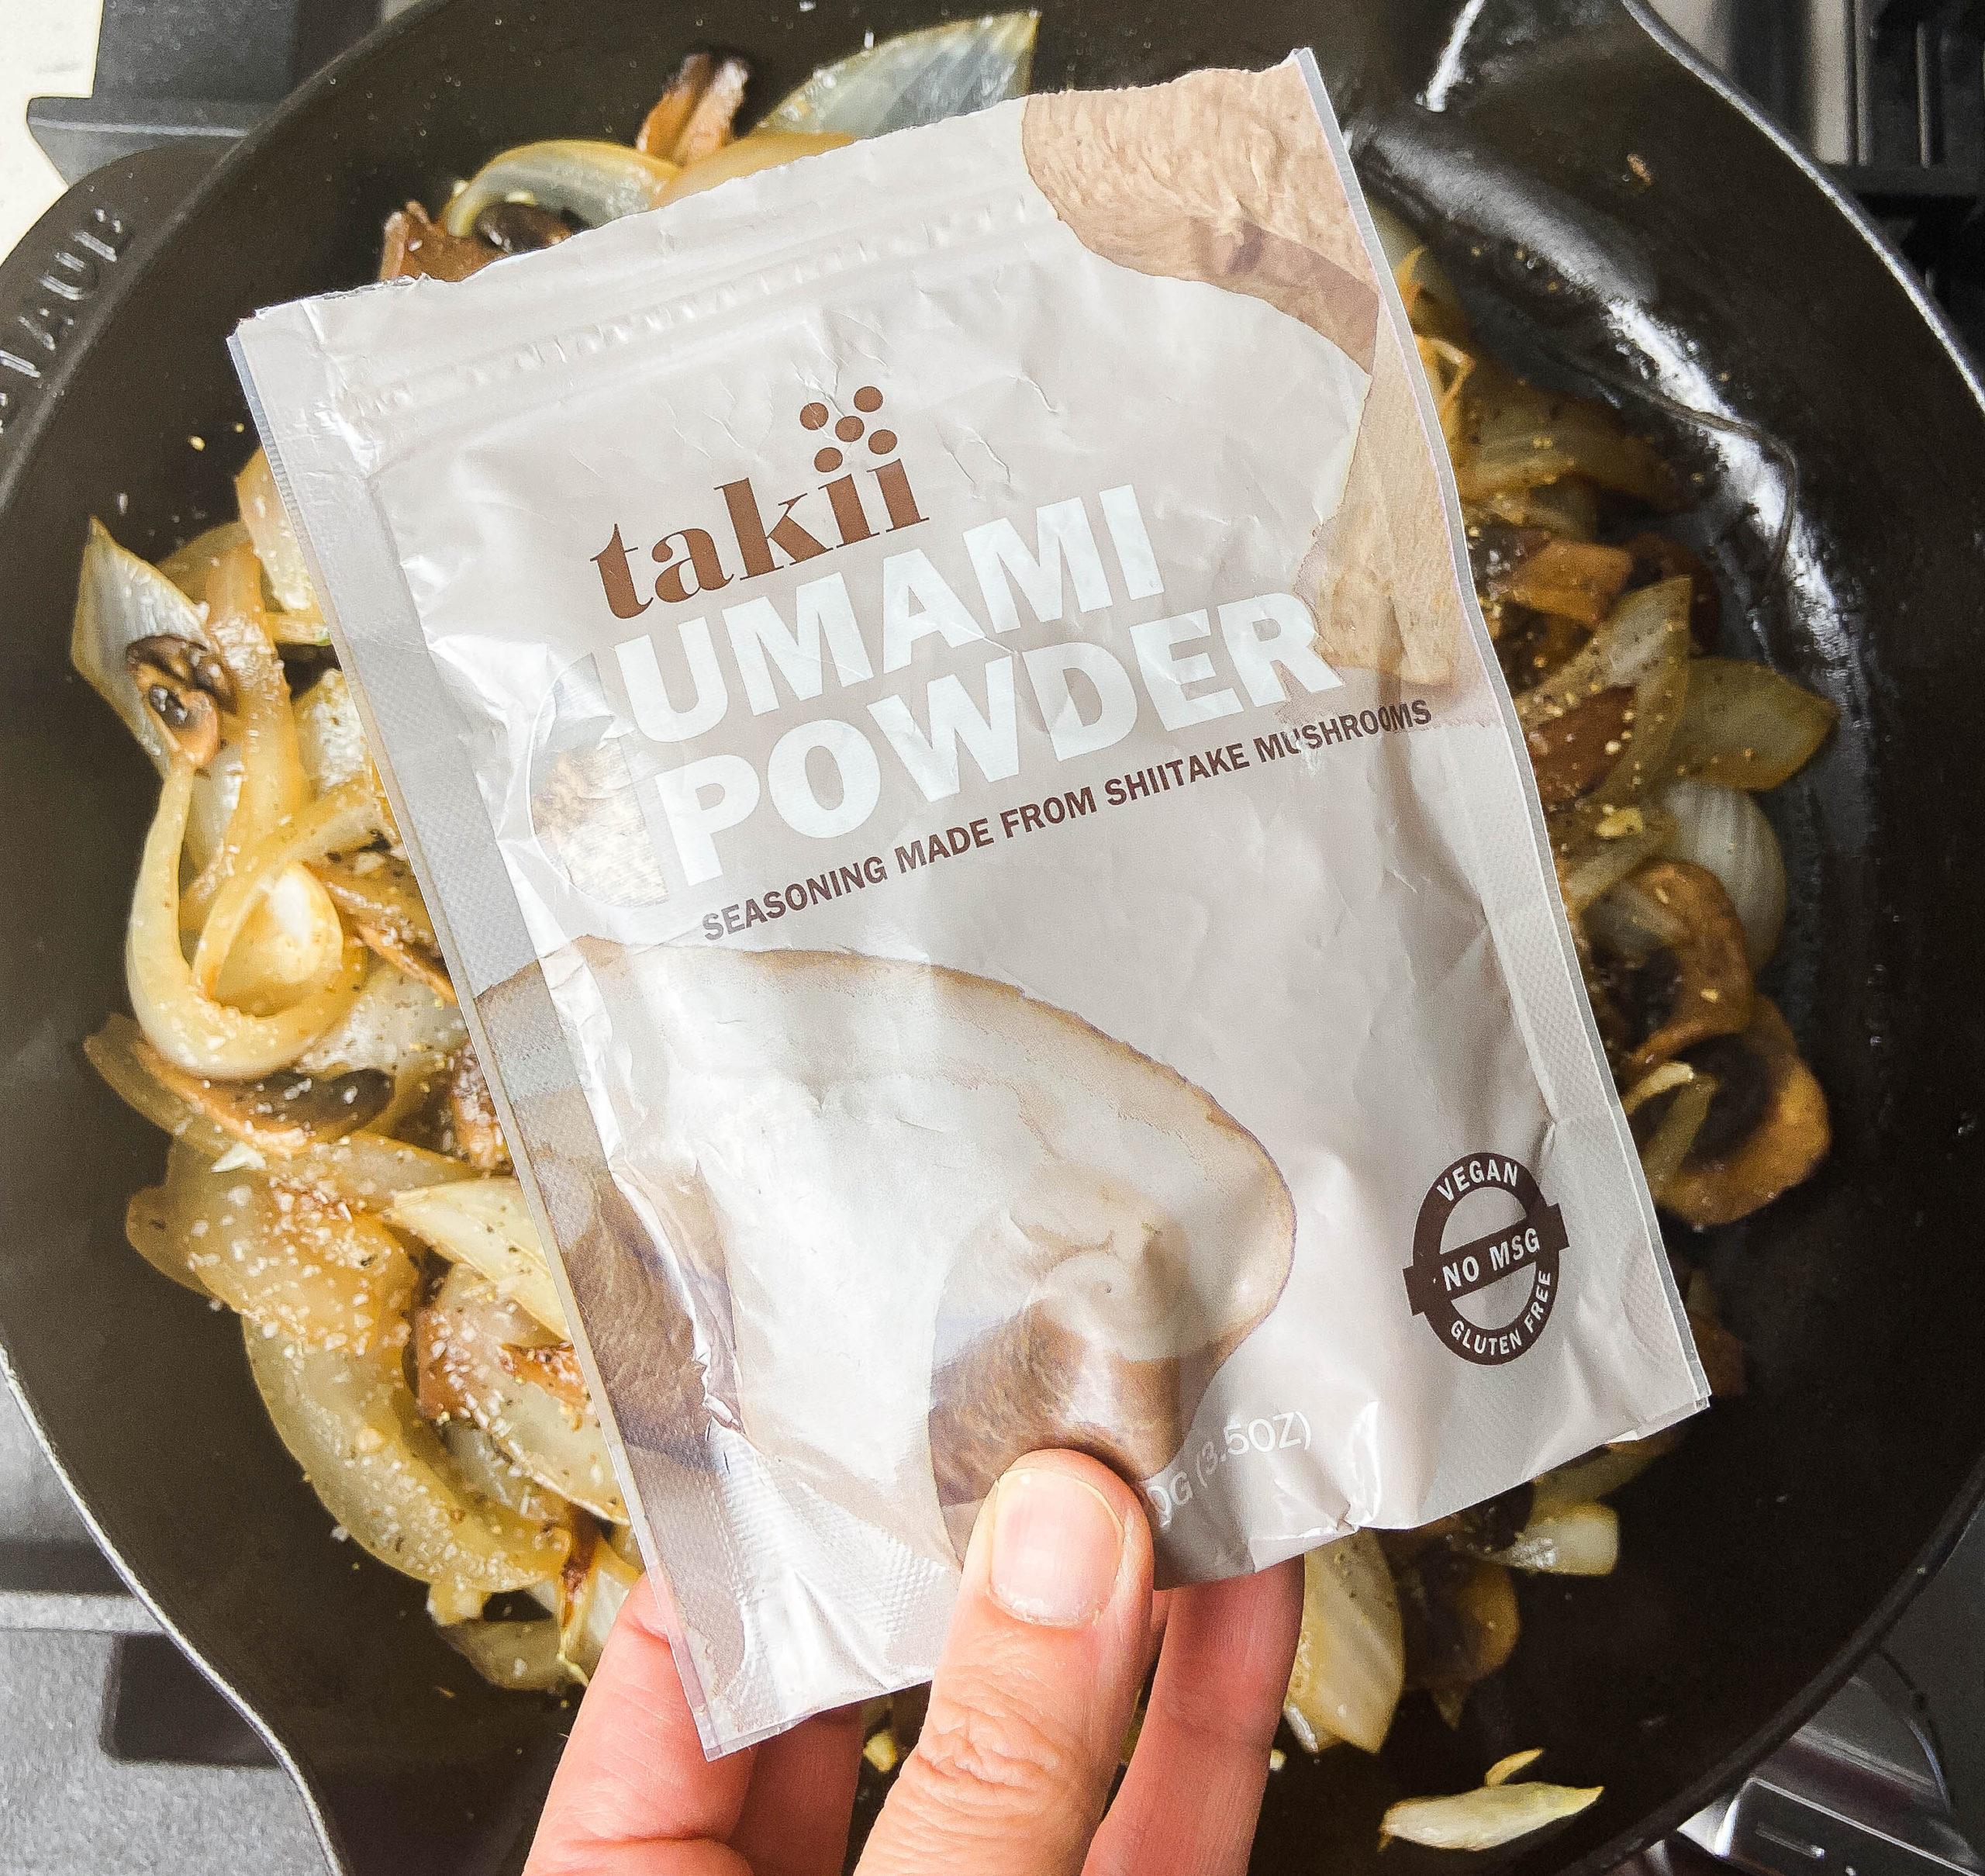 Umami mushroom powder package